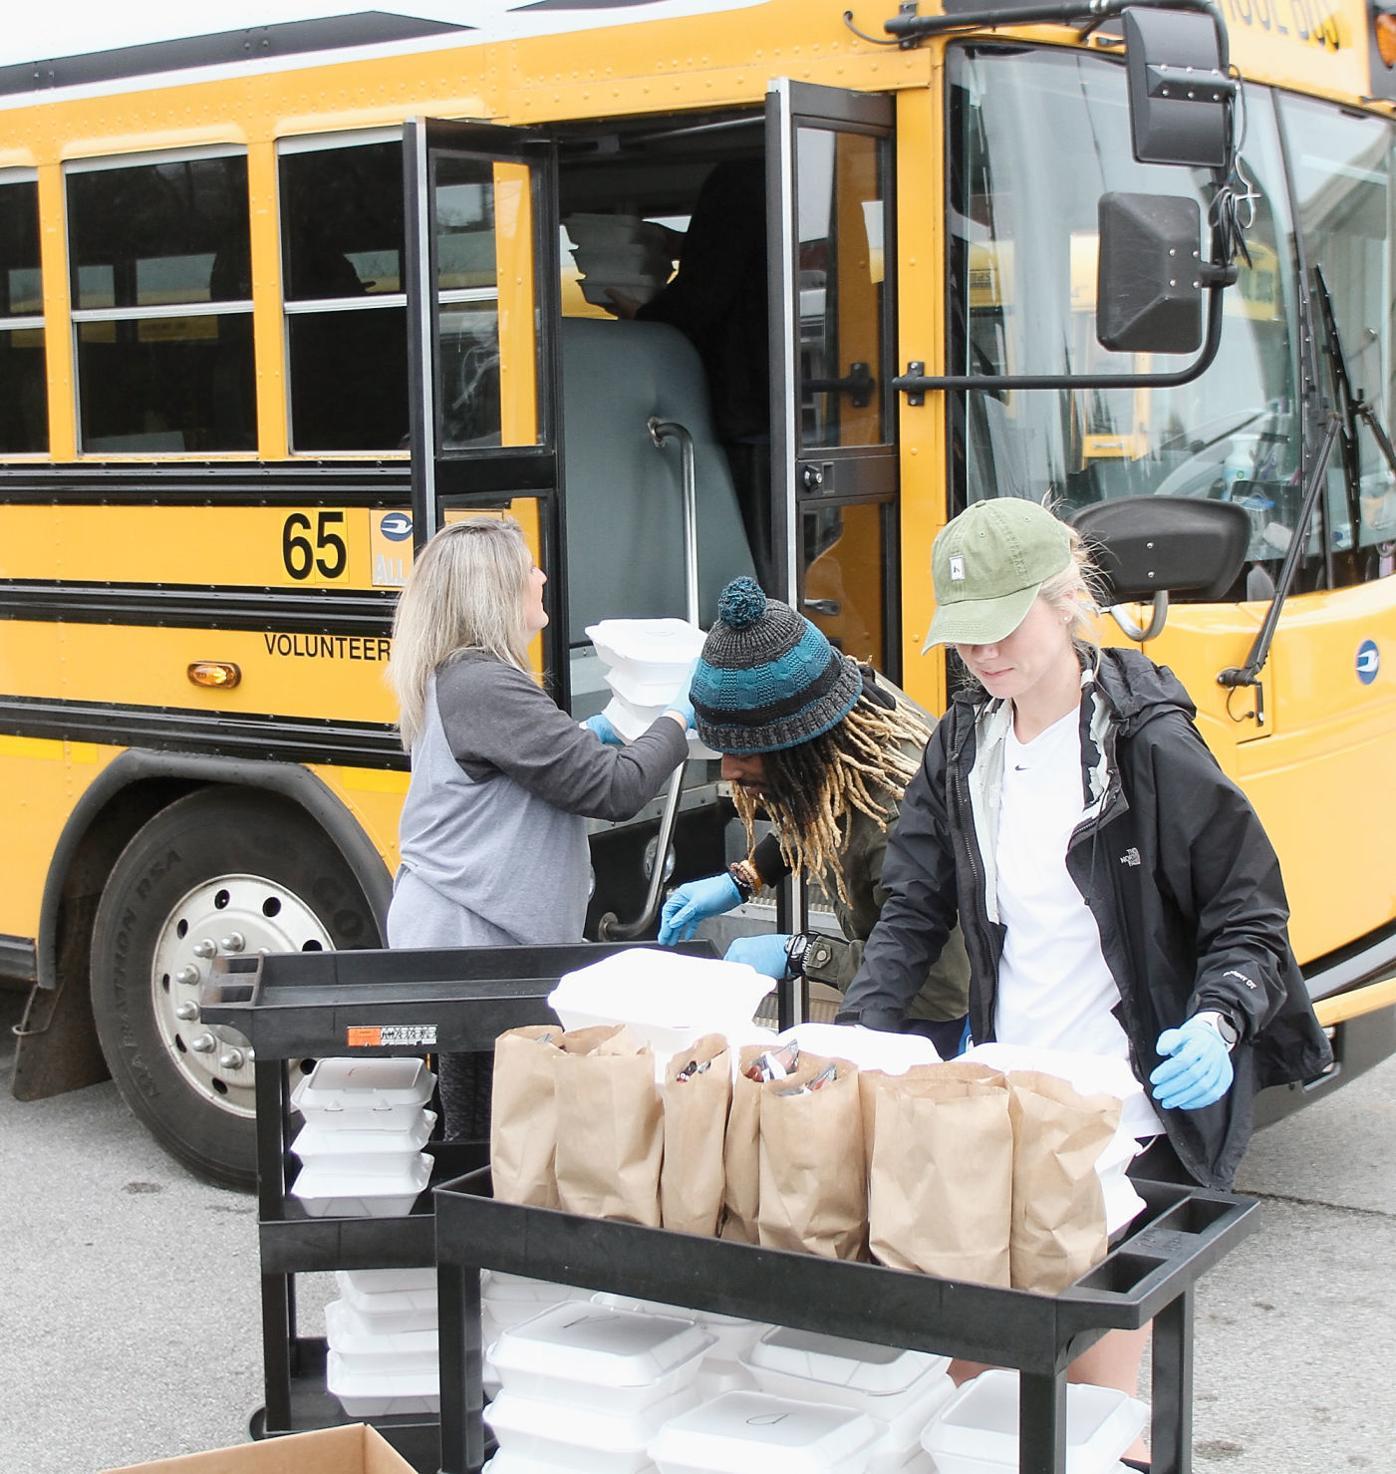 School buses deliver meals in Blount County